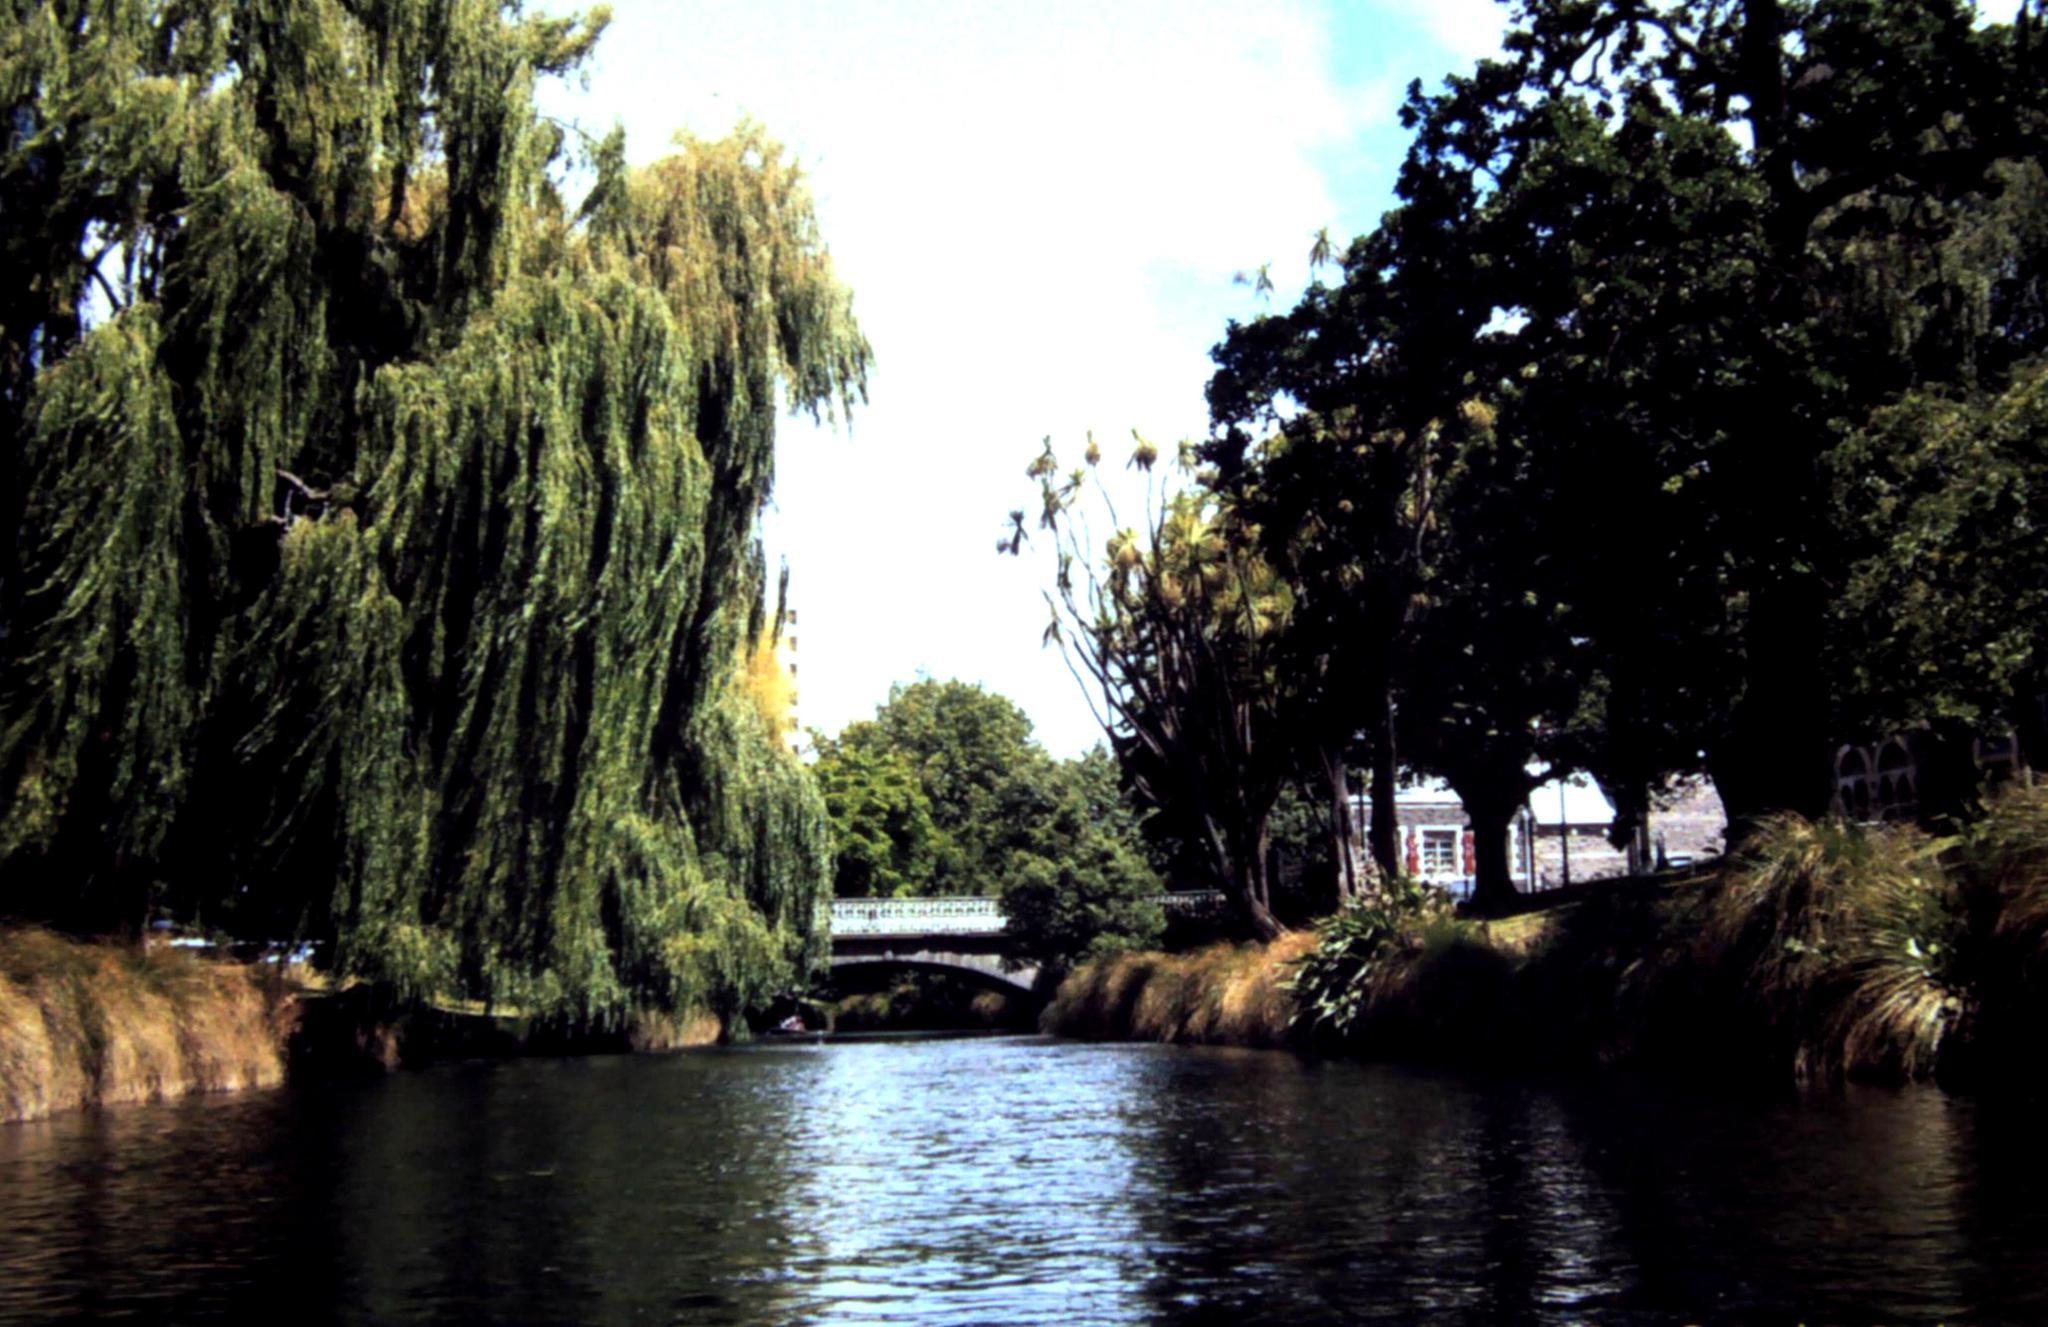 Punting on the Avon by pretblueye